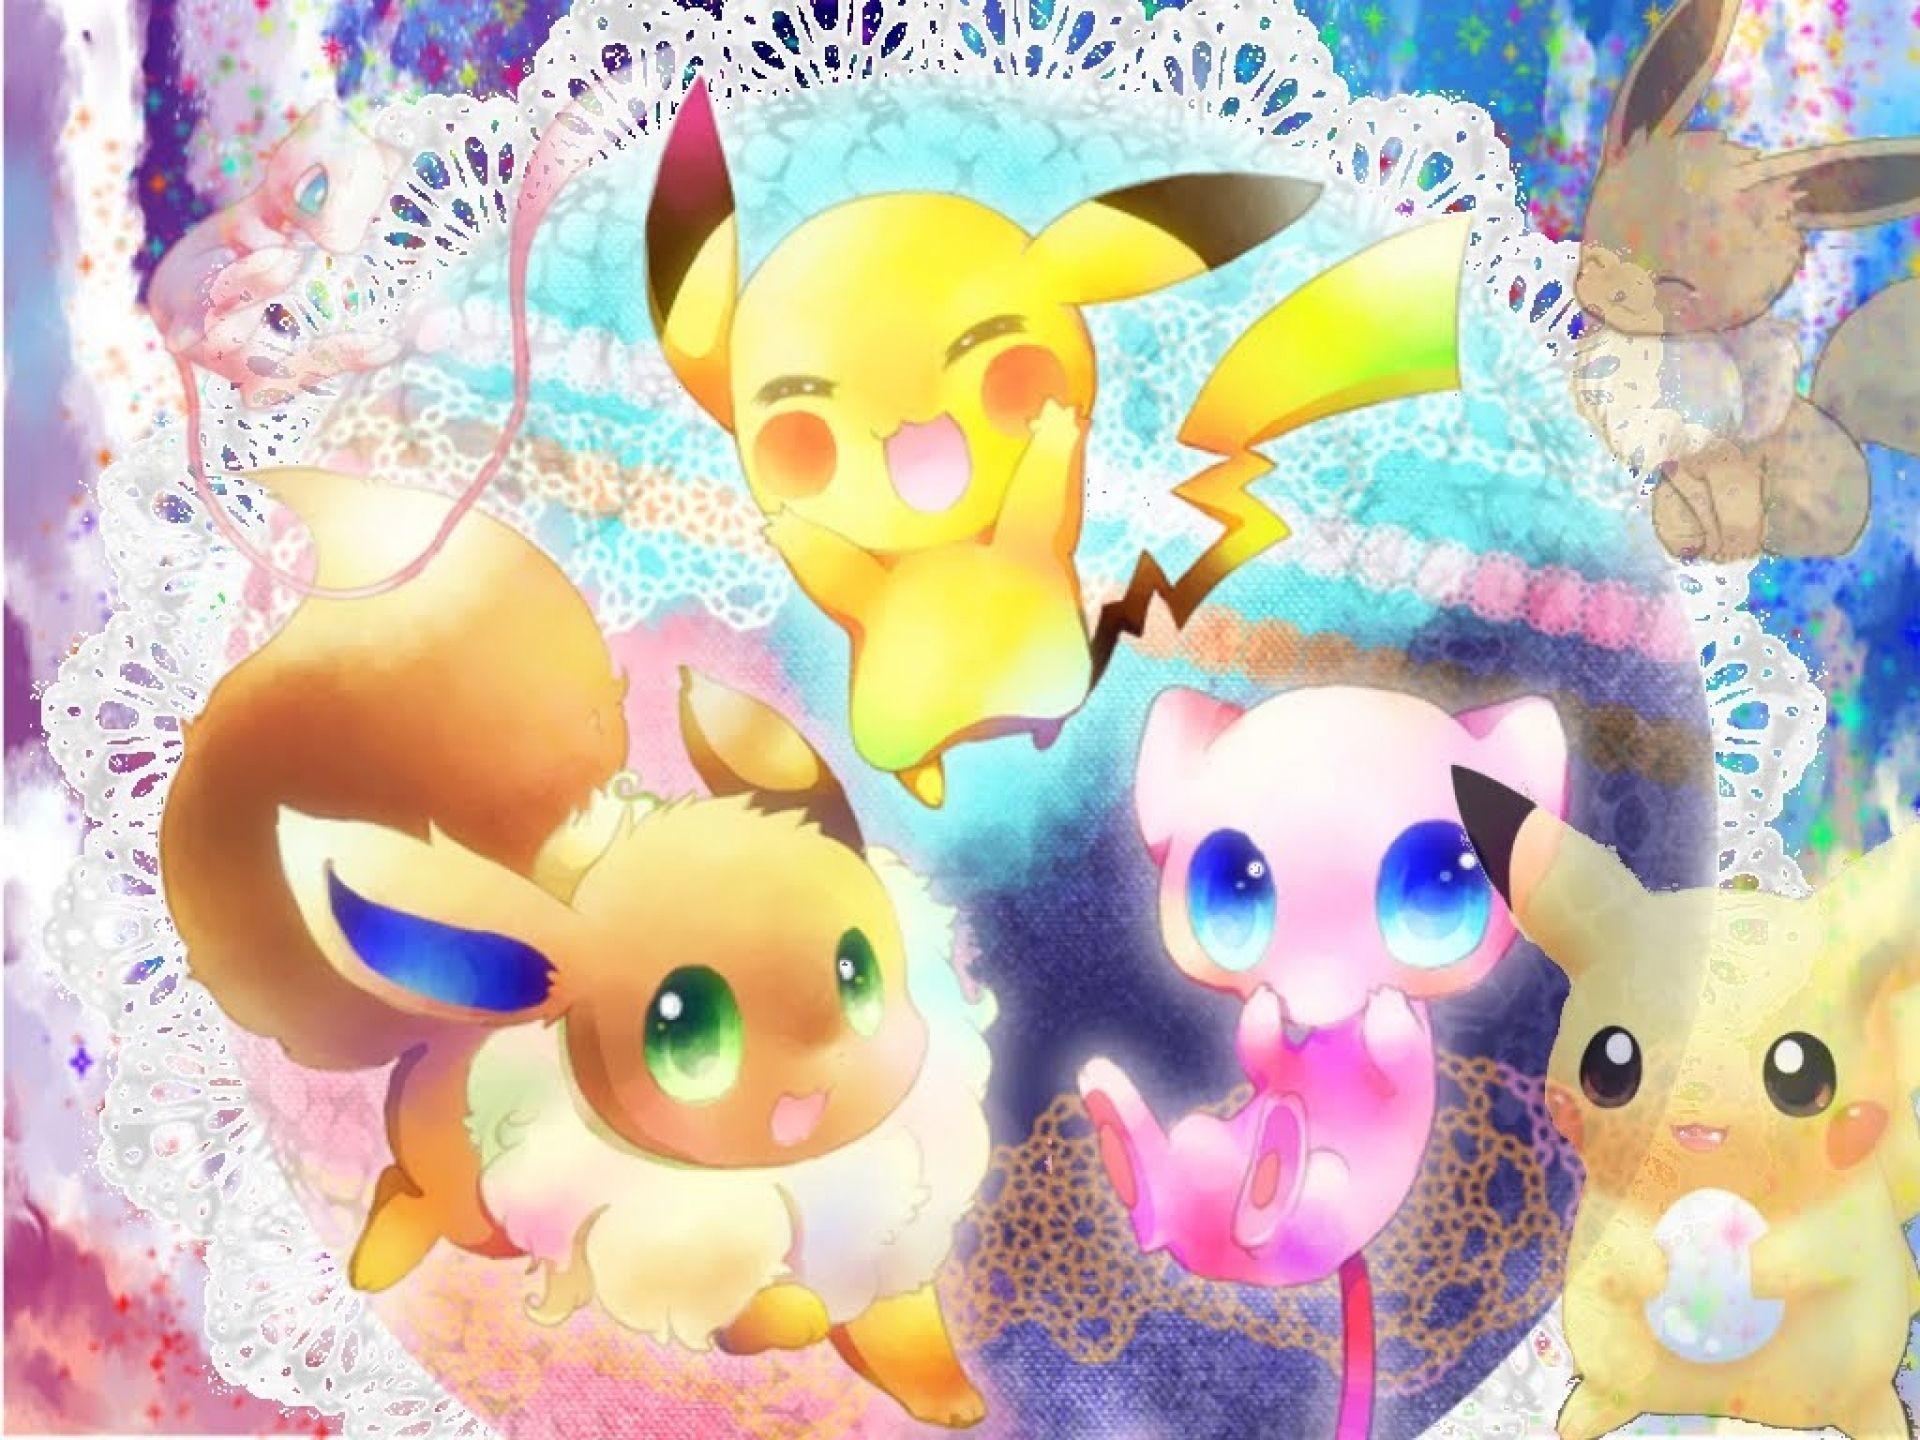 Res: 1920x1440, HD wallpaper Cute Pokemon Wallpaper Free #48t0 | Desktop HD wallpaper.  Stock photos HD